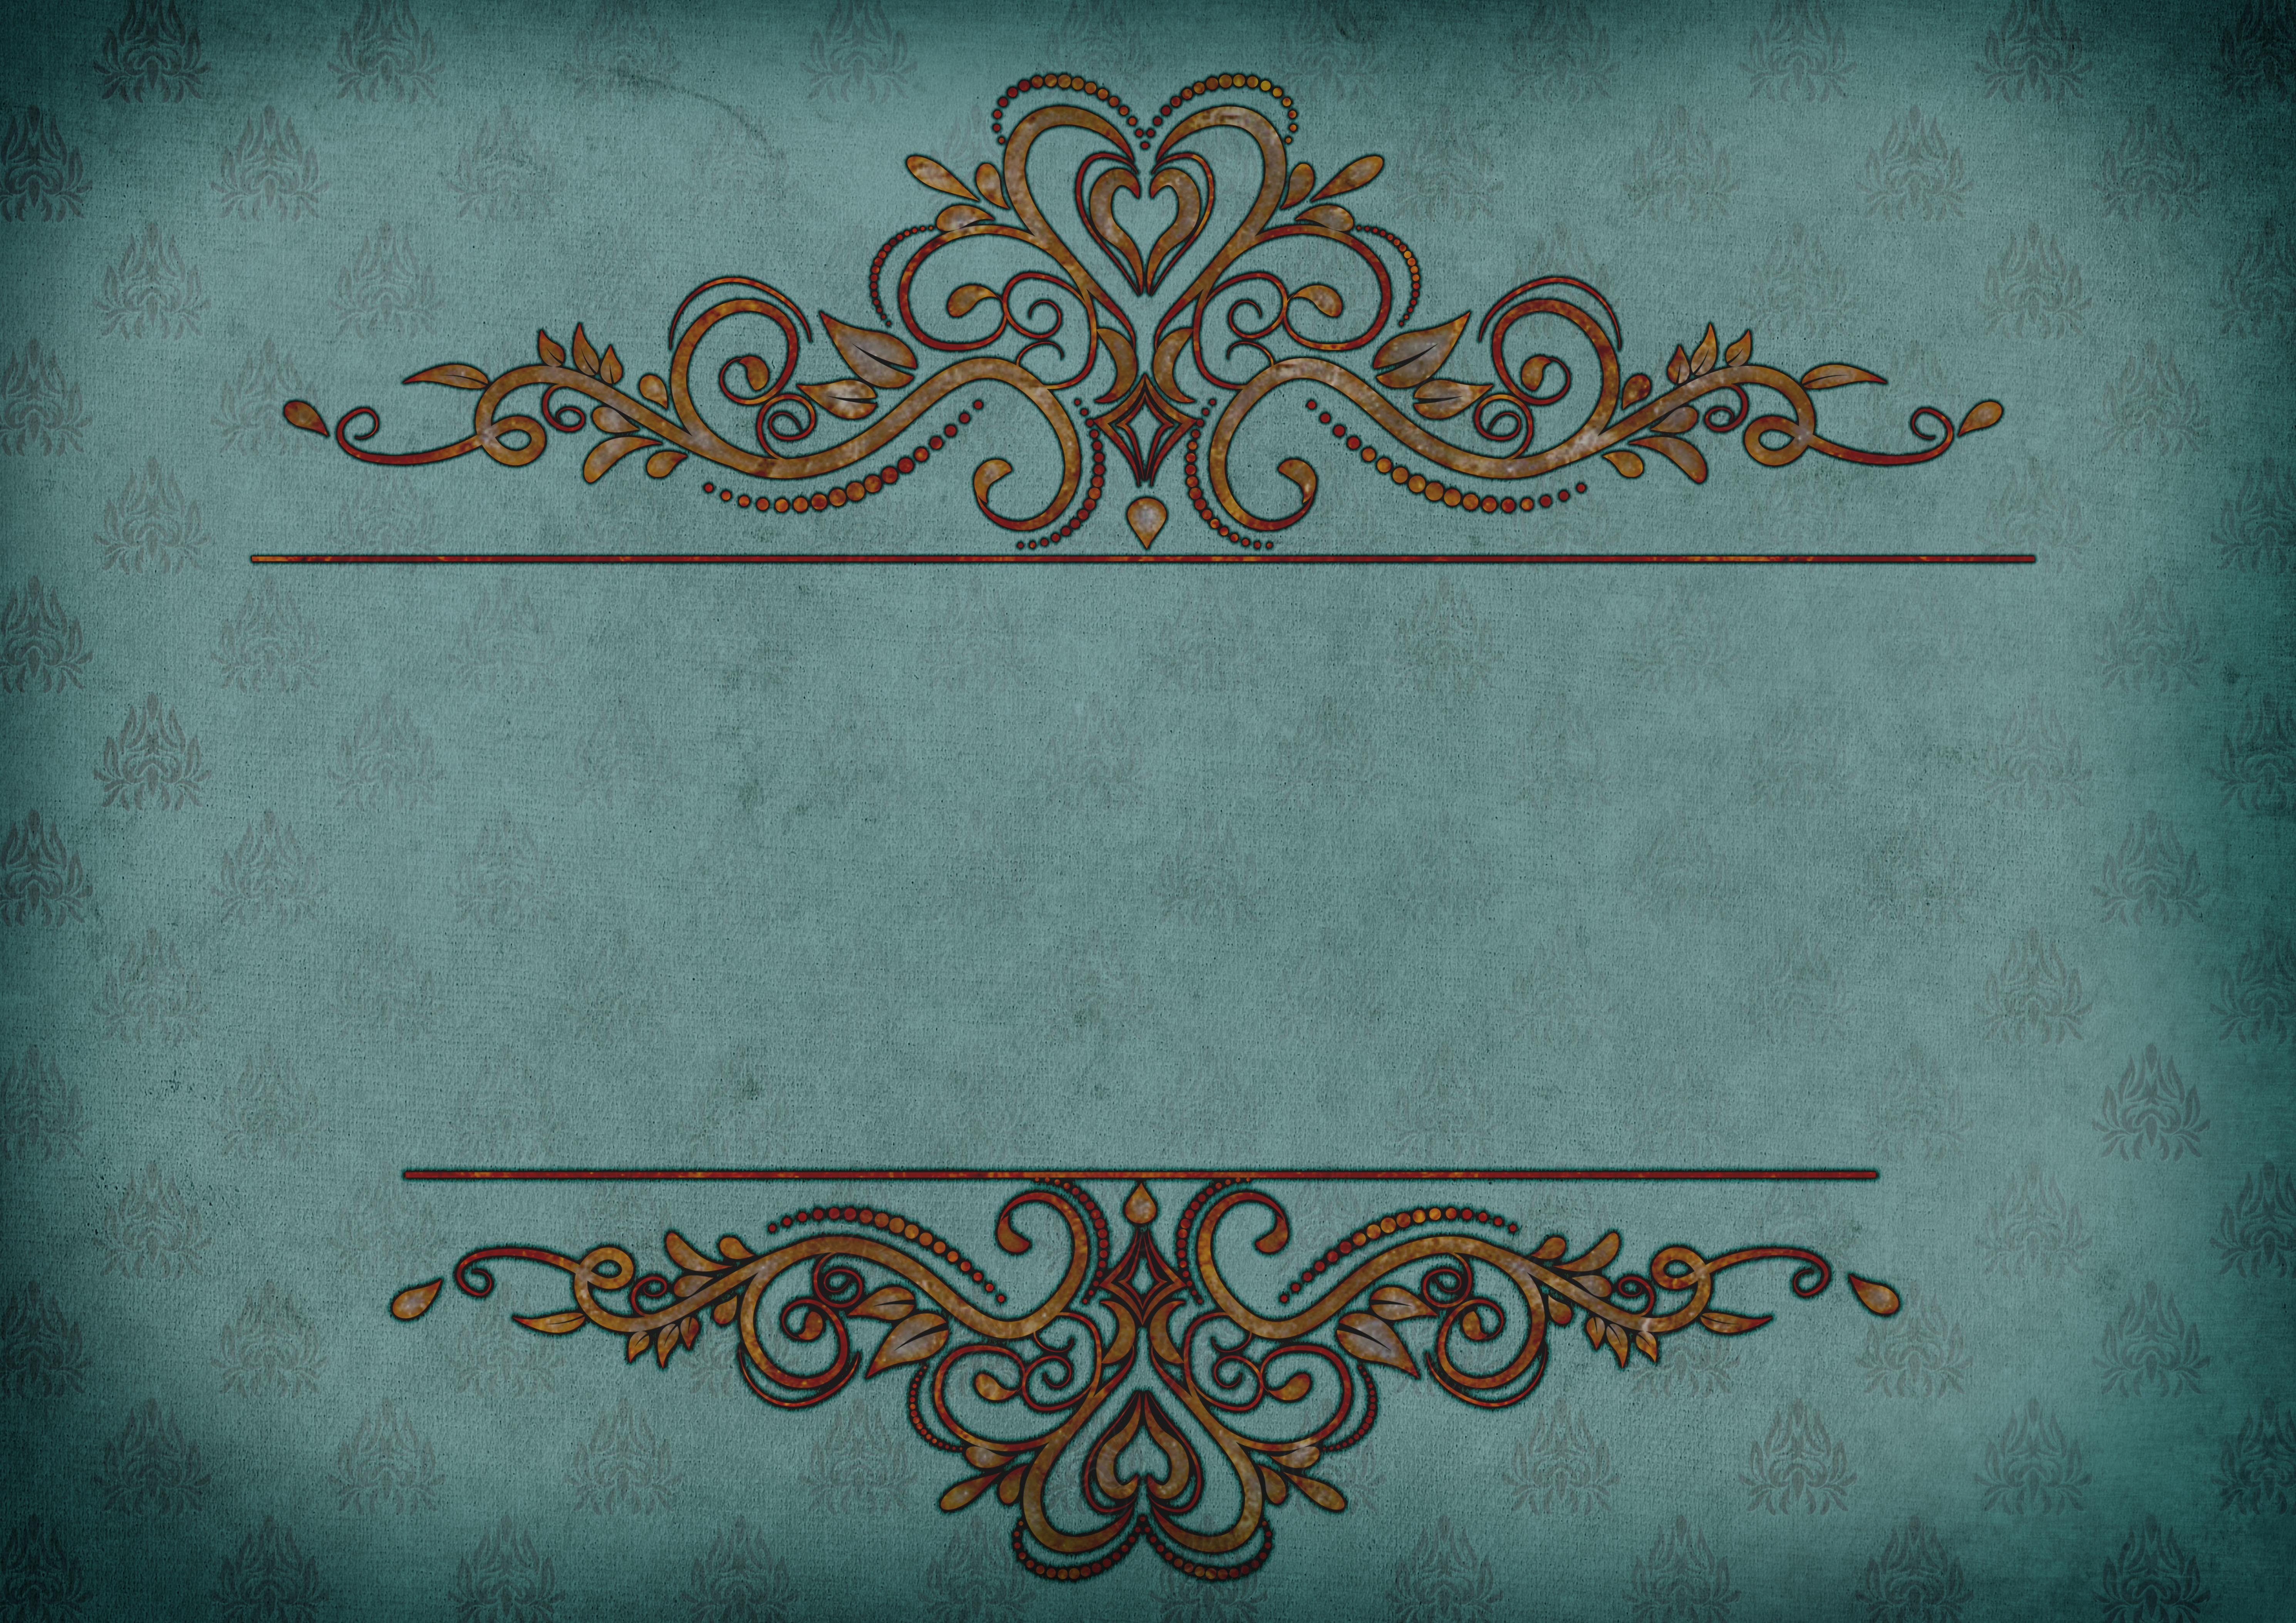 gambar latar belakang pola bunga ornamen pernikahan dekoratif vintage buku tempel mulia percintaan salam kartu pos desain ulang tahun kartu ucapan bingkai ruang copy kosong bergaya undangan peta kupon teks seni pxhere